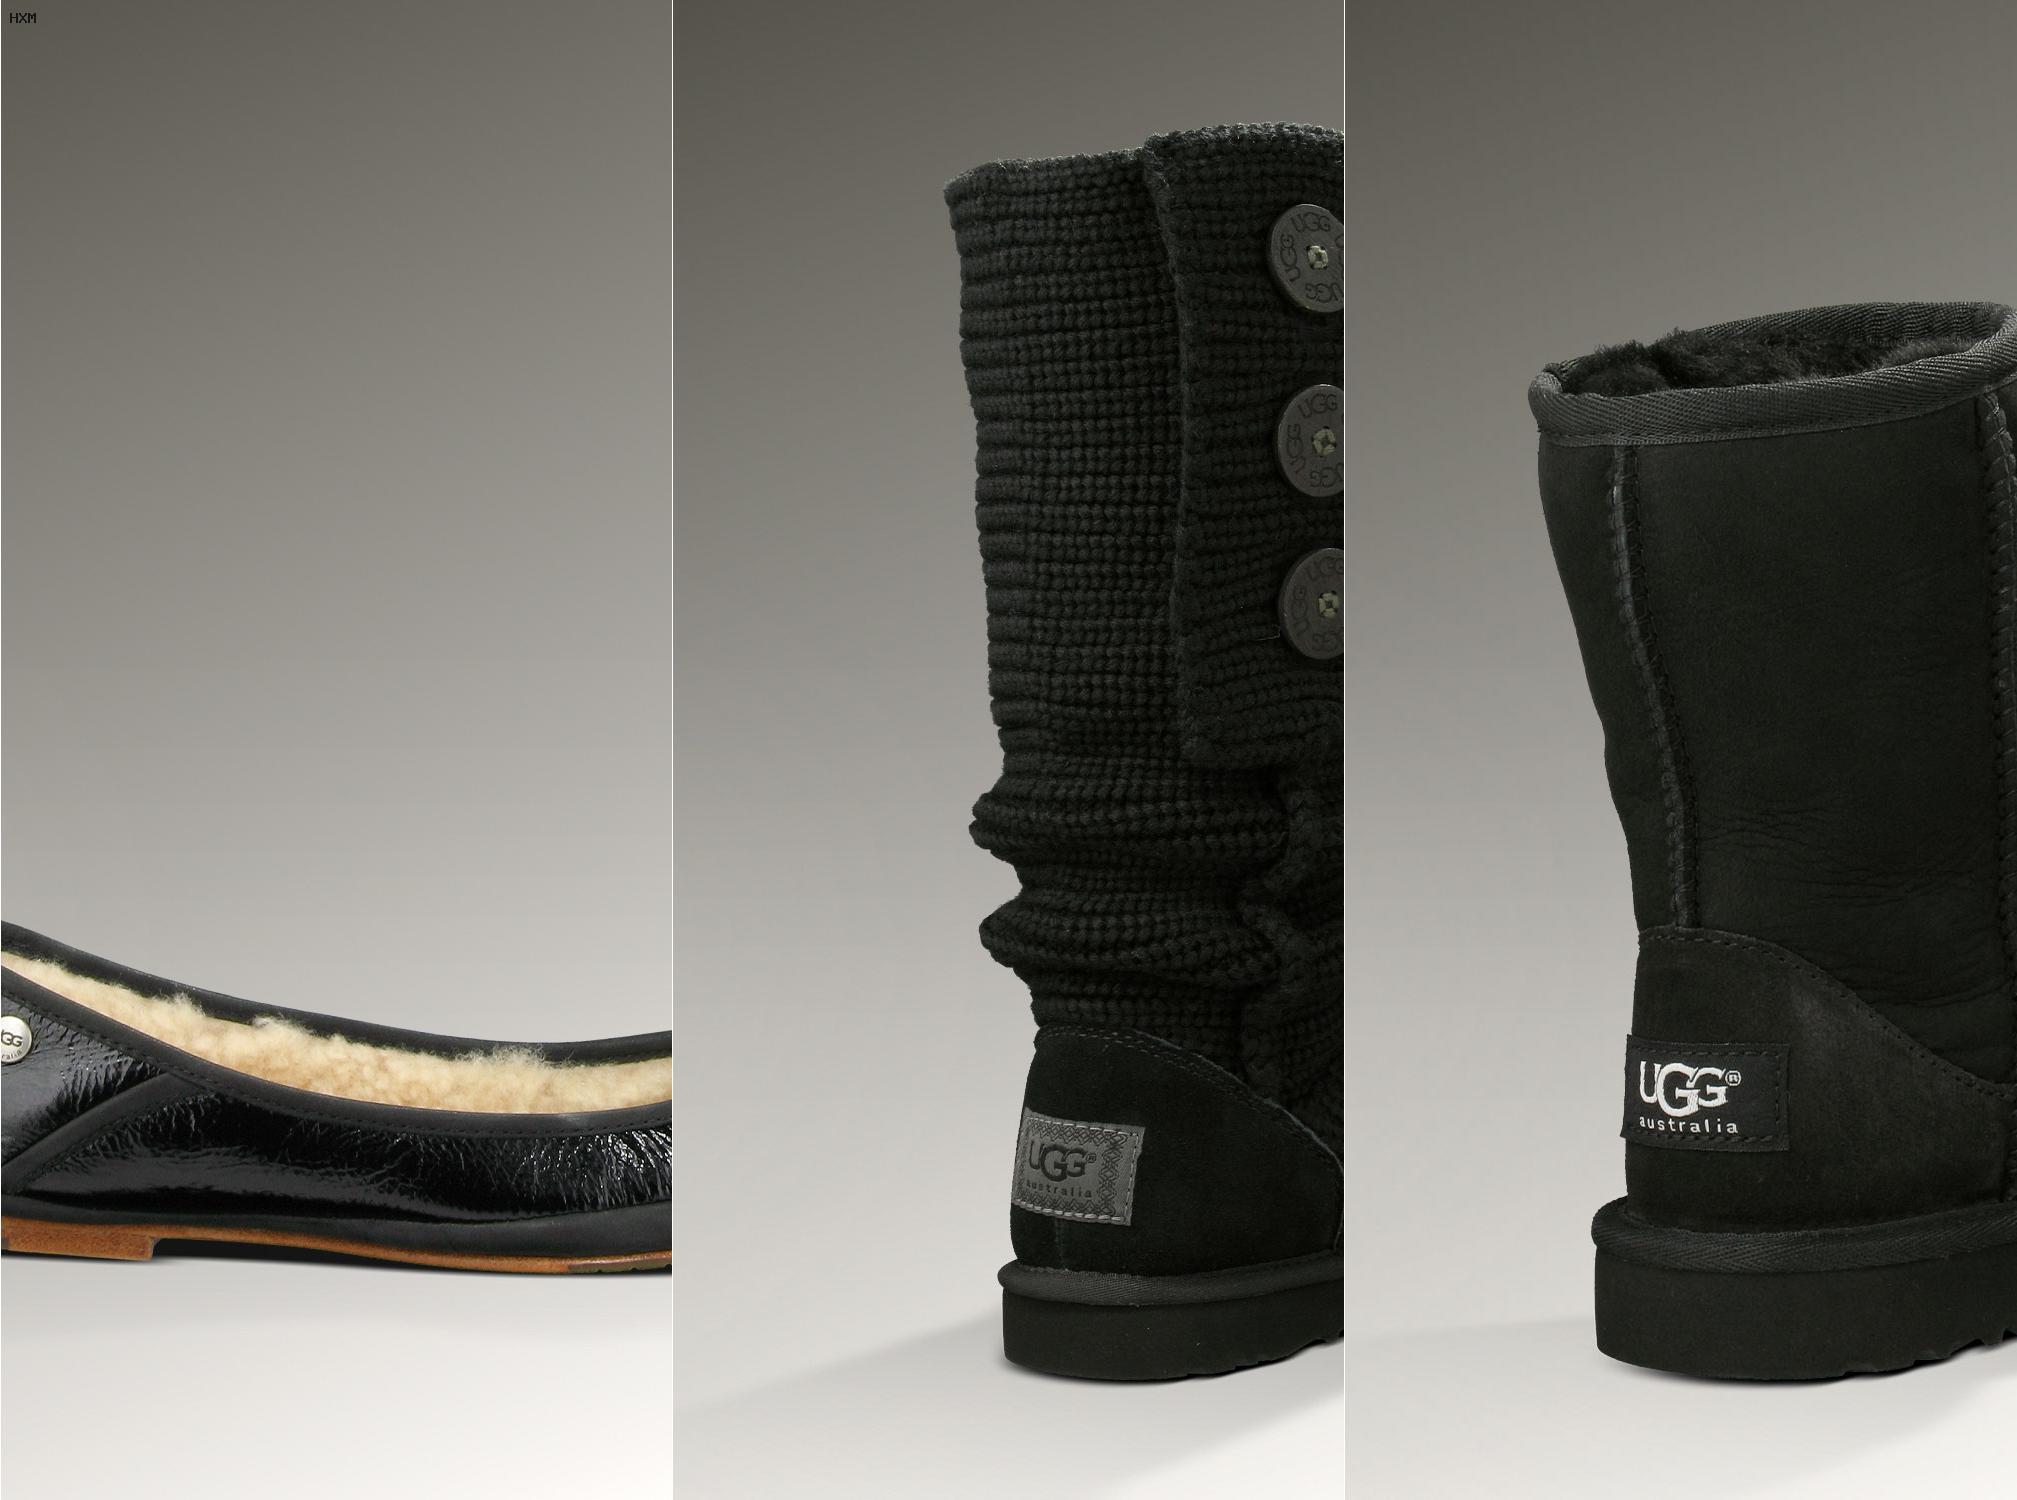 marca ugg zapatos